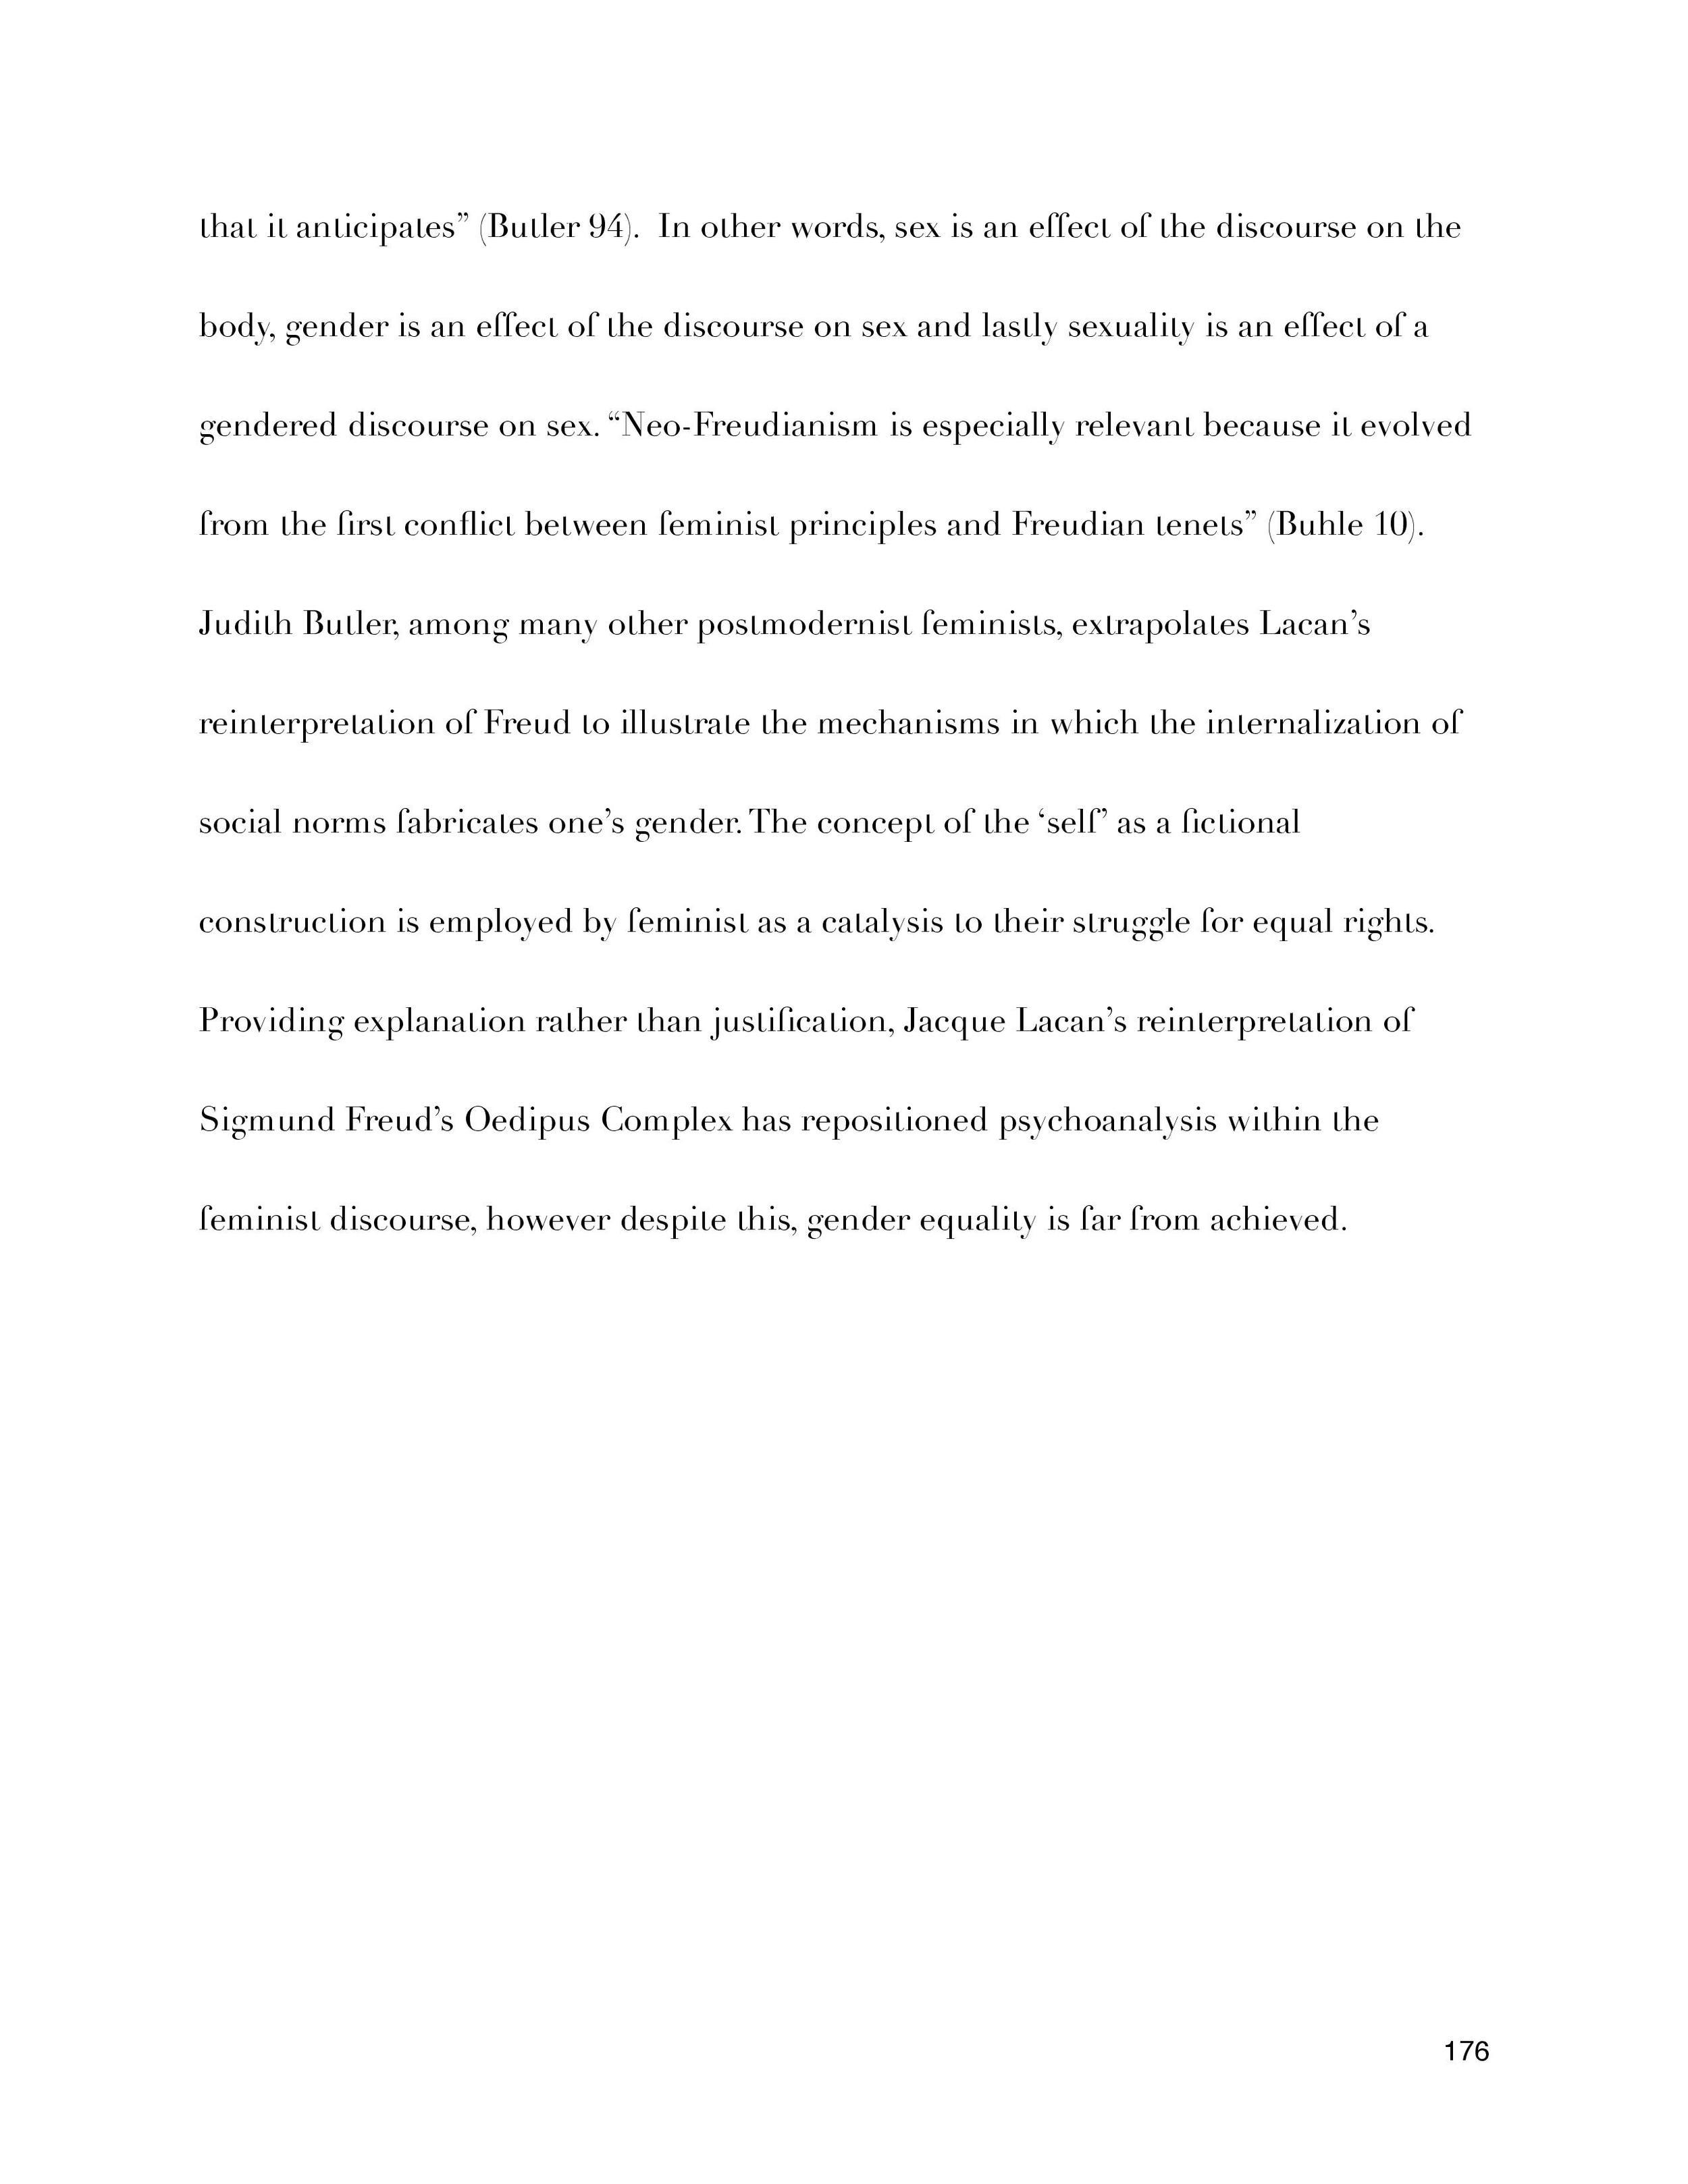 ShatteredGlass-page-177.jpg